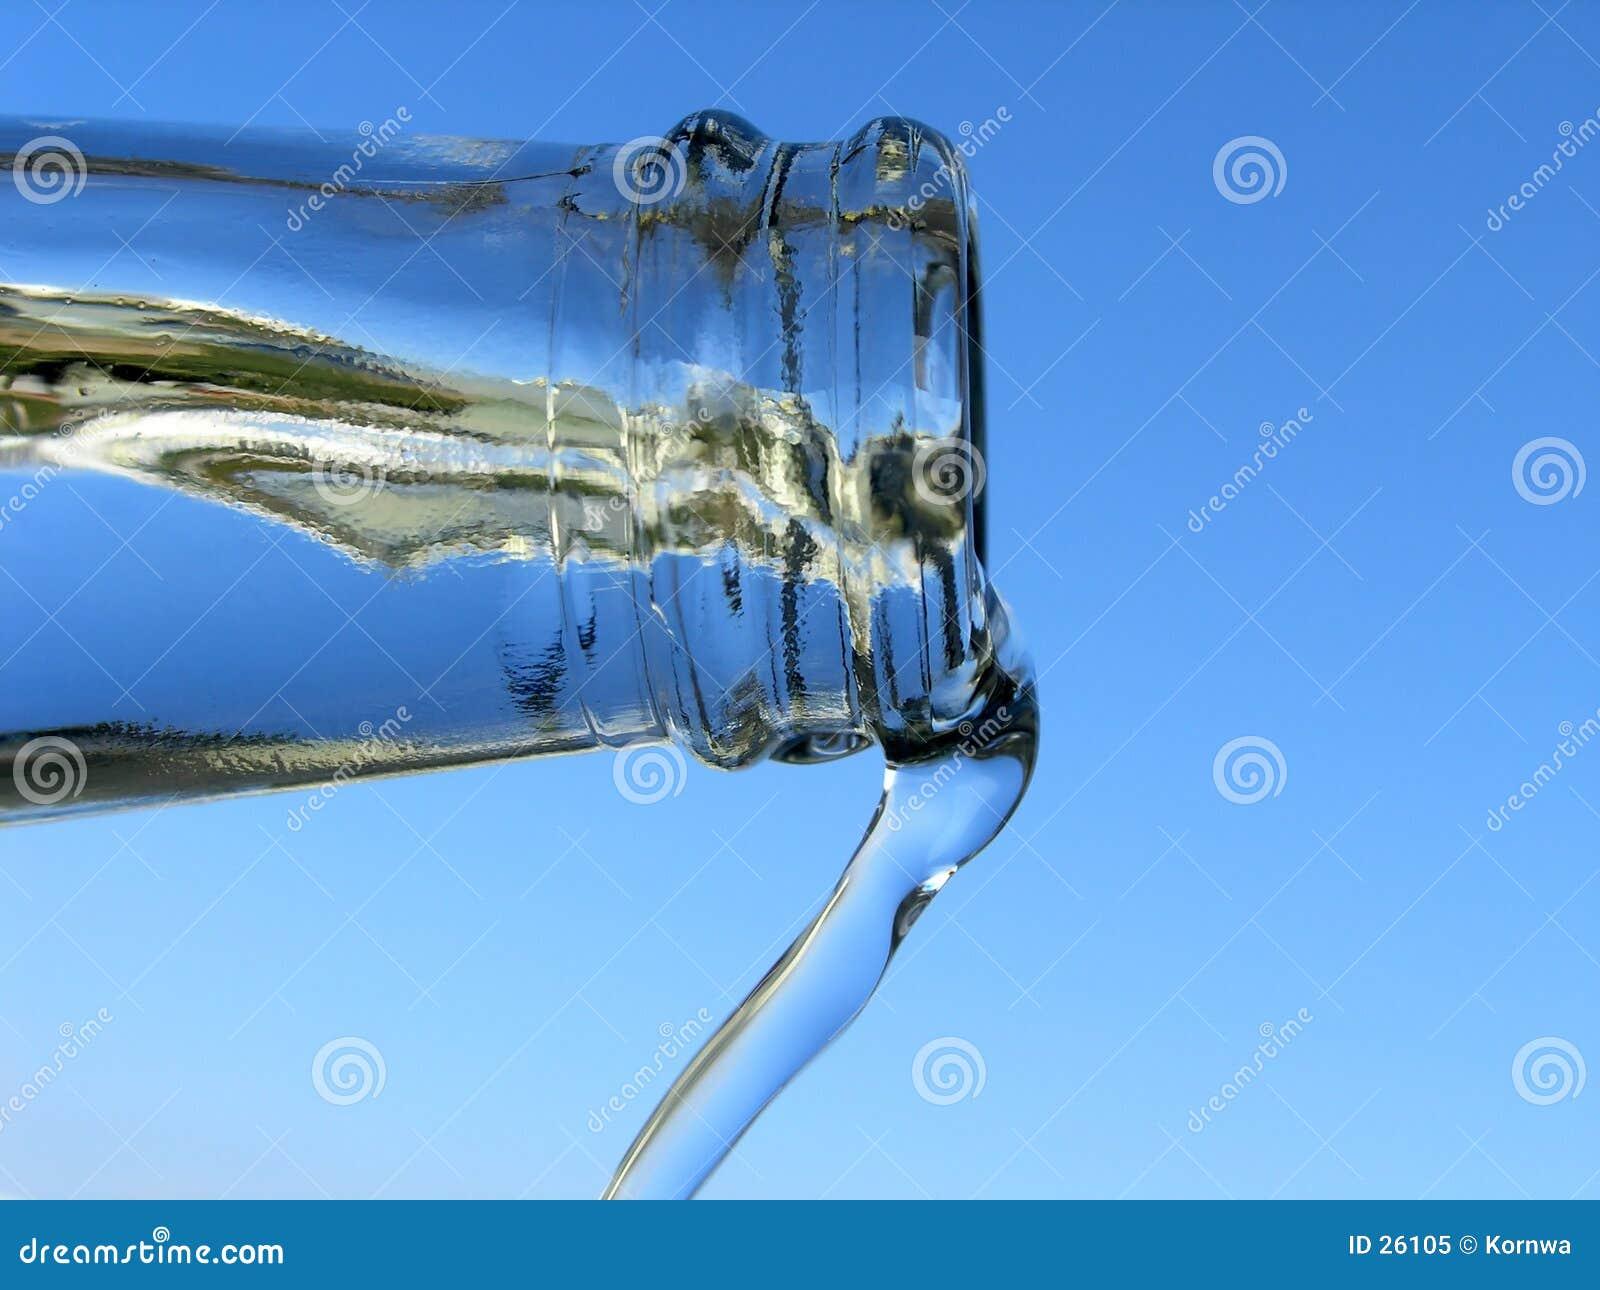 Verse wodkadrank